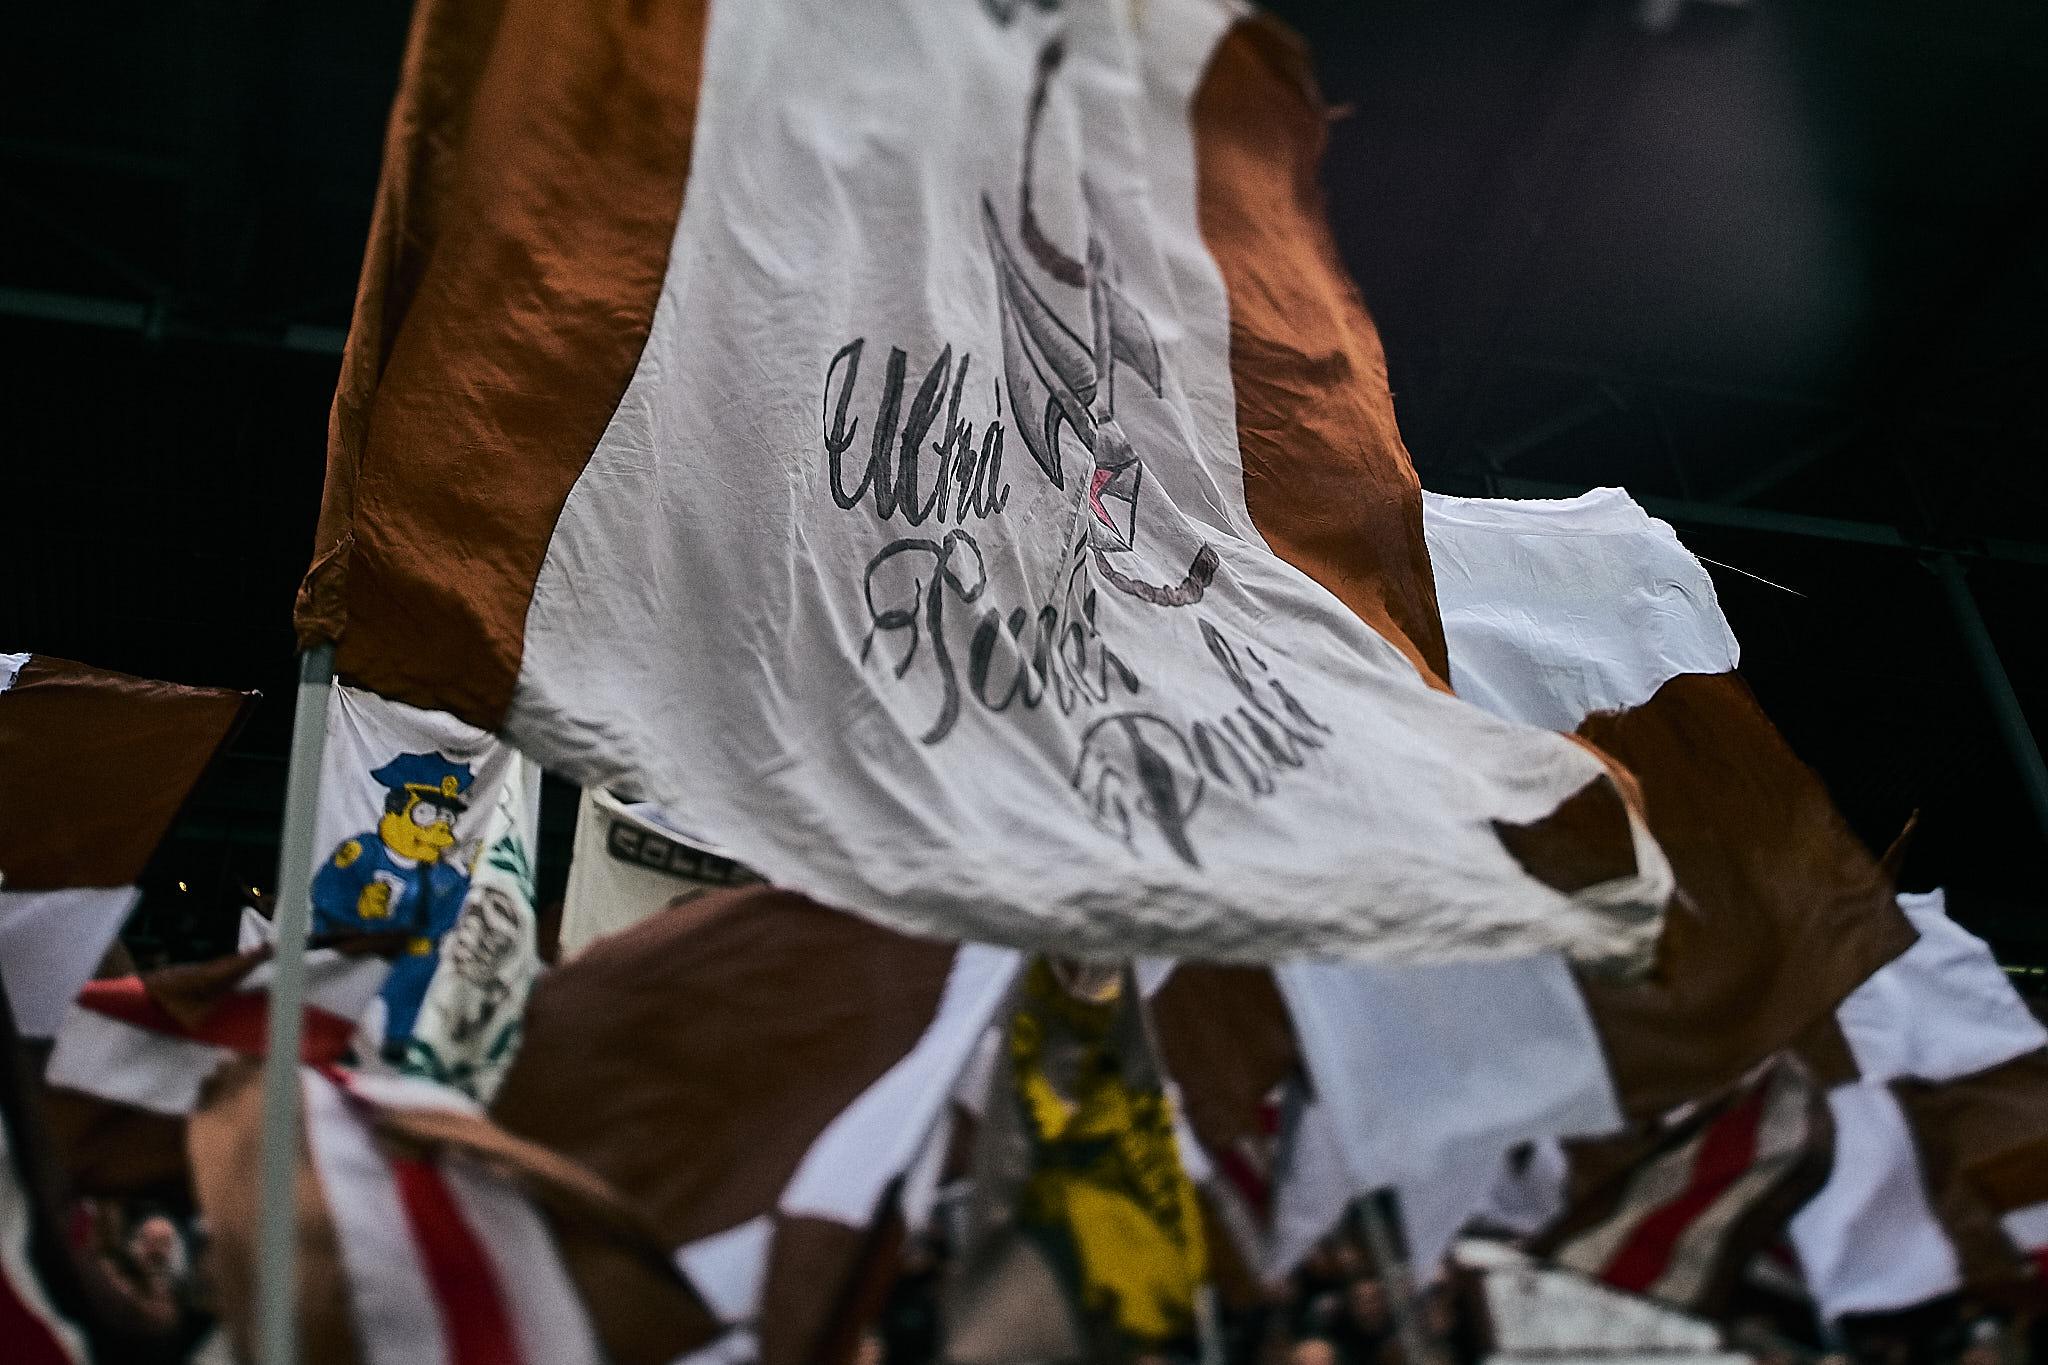 Vor dem Spiel – VfL Osnabrück (A) – Spieltag 7 – Saison 2019/20